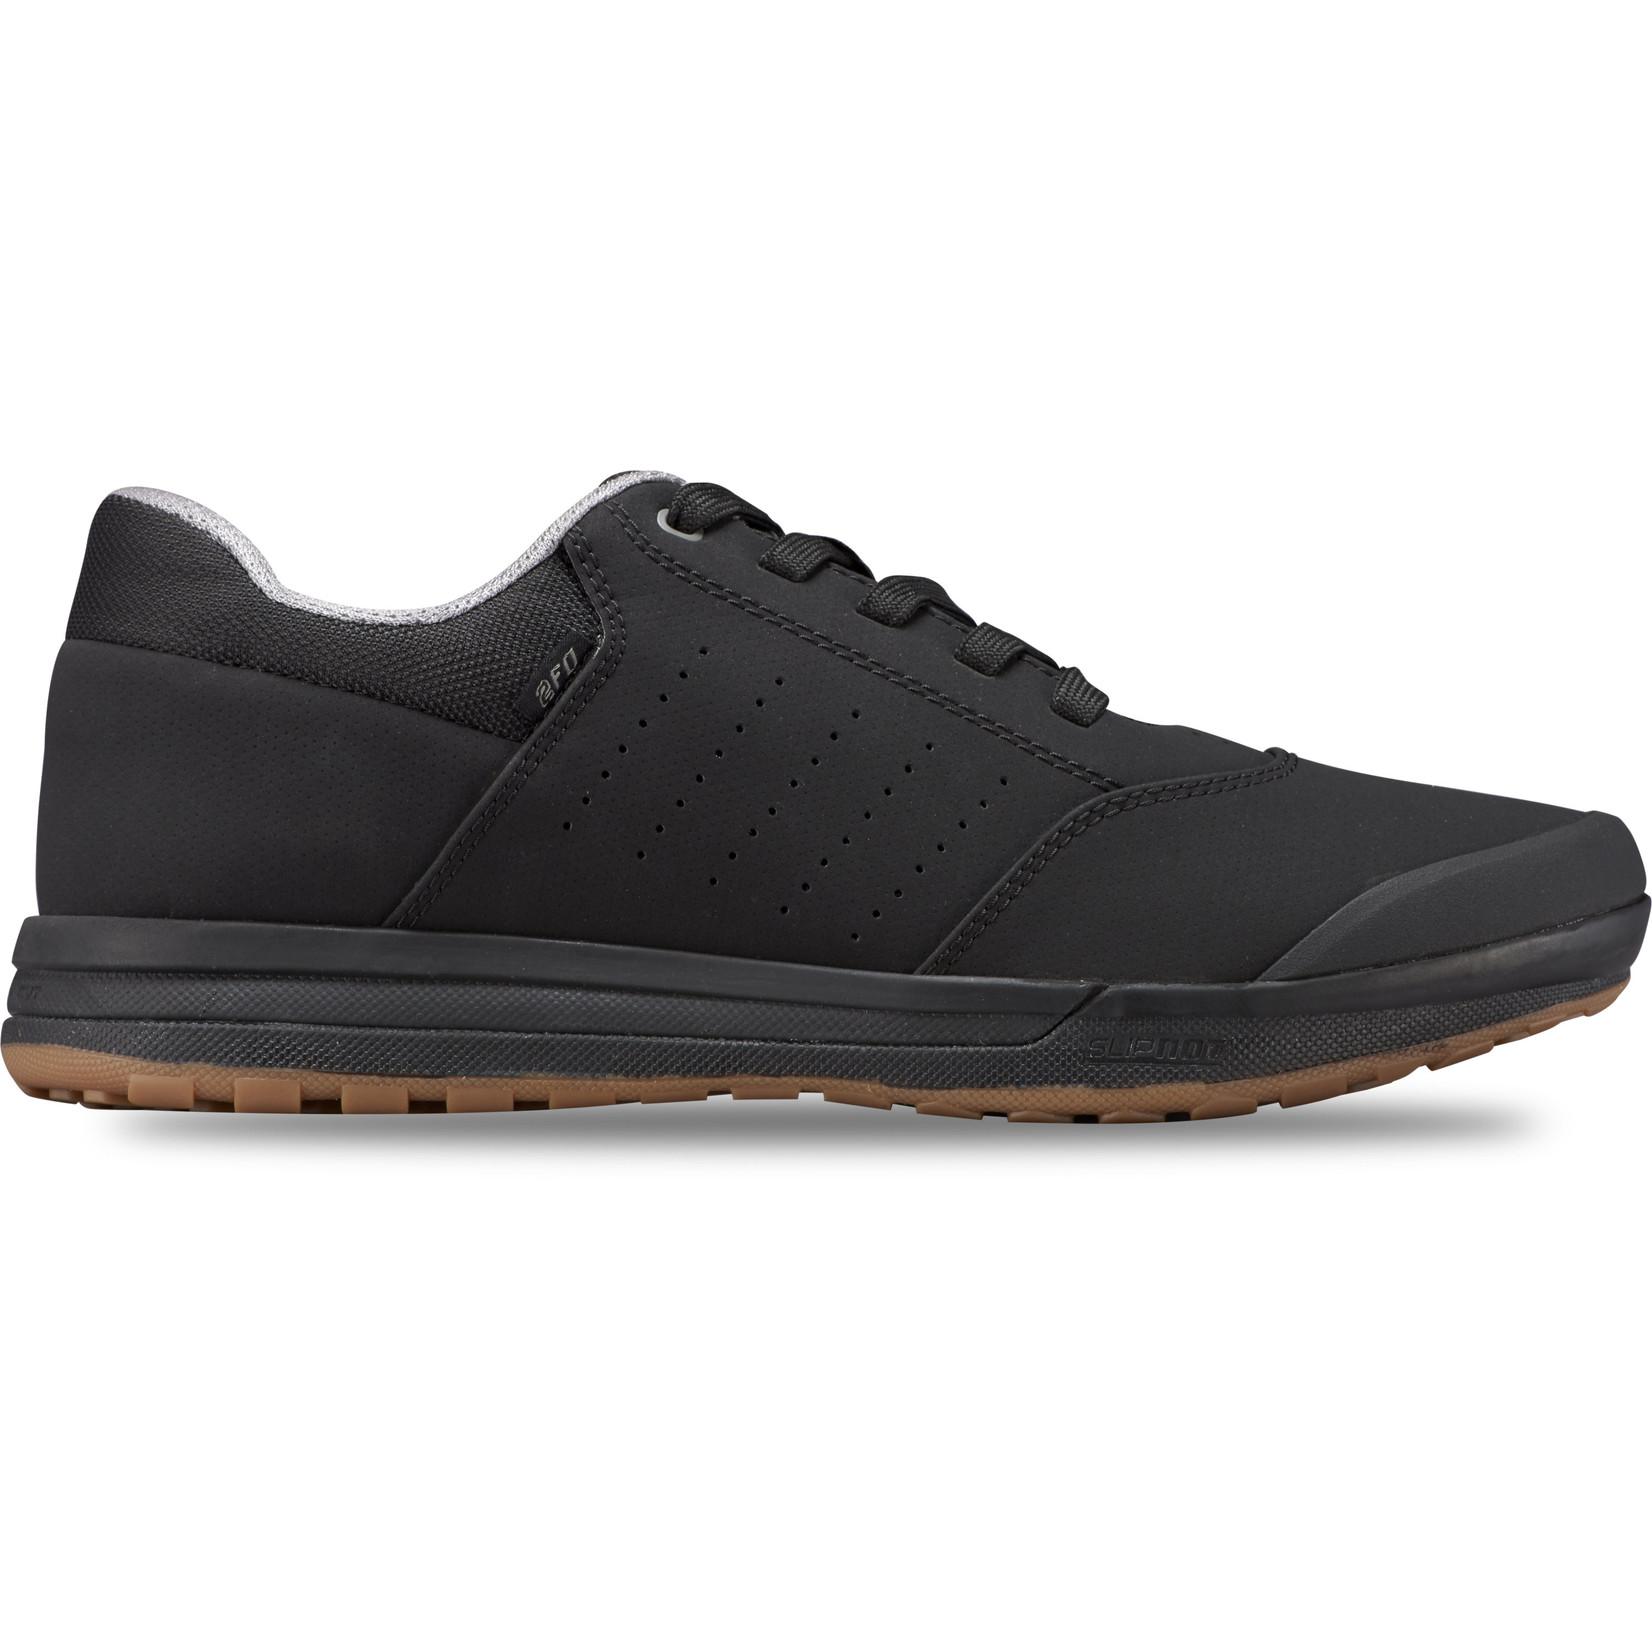 2FO Roost Clip MTB Shoe Blk/Gum 43.5